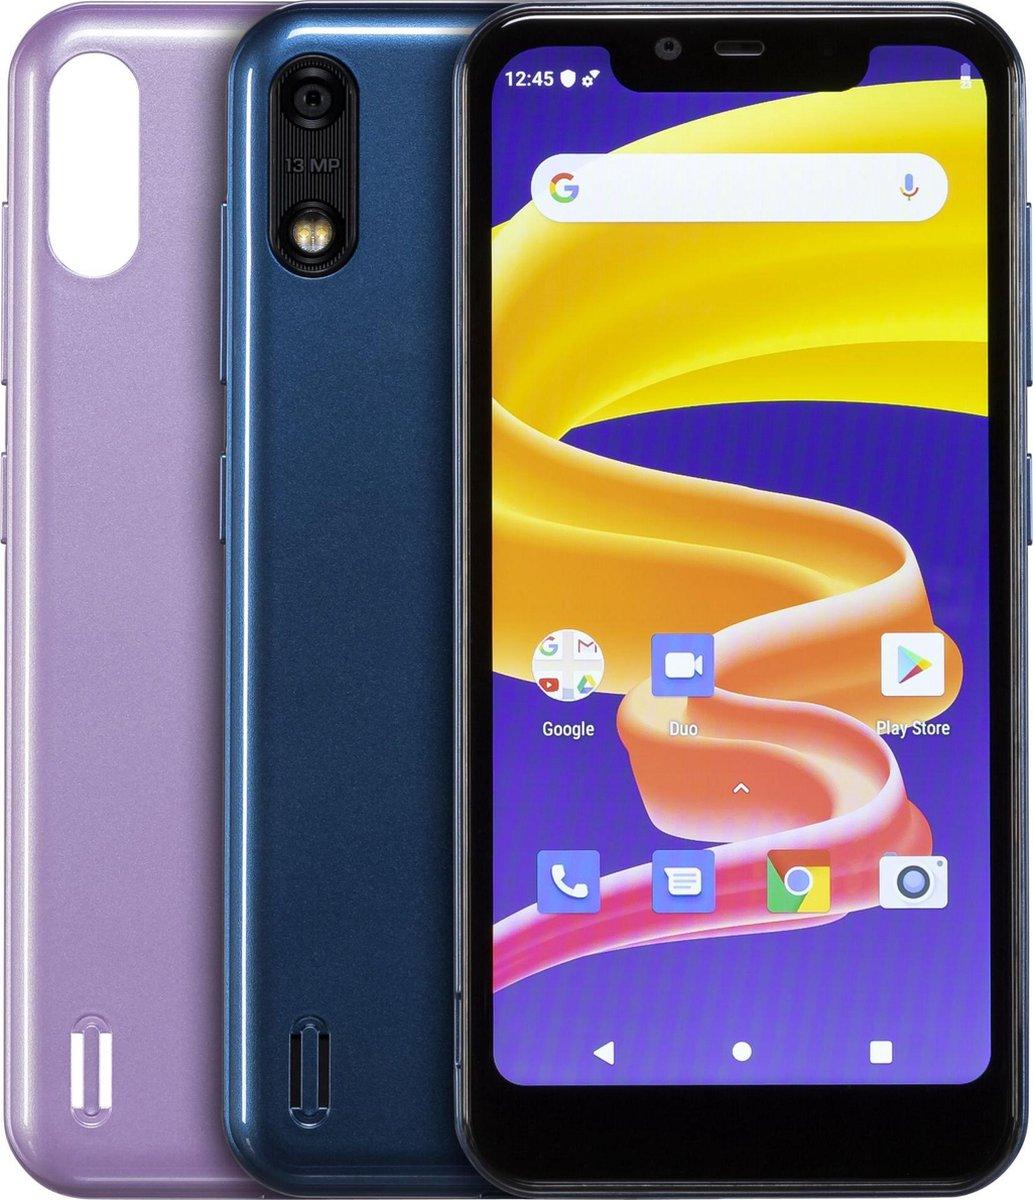 Blabloo Wave 1 Kinder- Smartphone 16 GB 5.45 inch (13.8 cm) Dual-SIM Android 9.0 Blauw, Pink